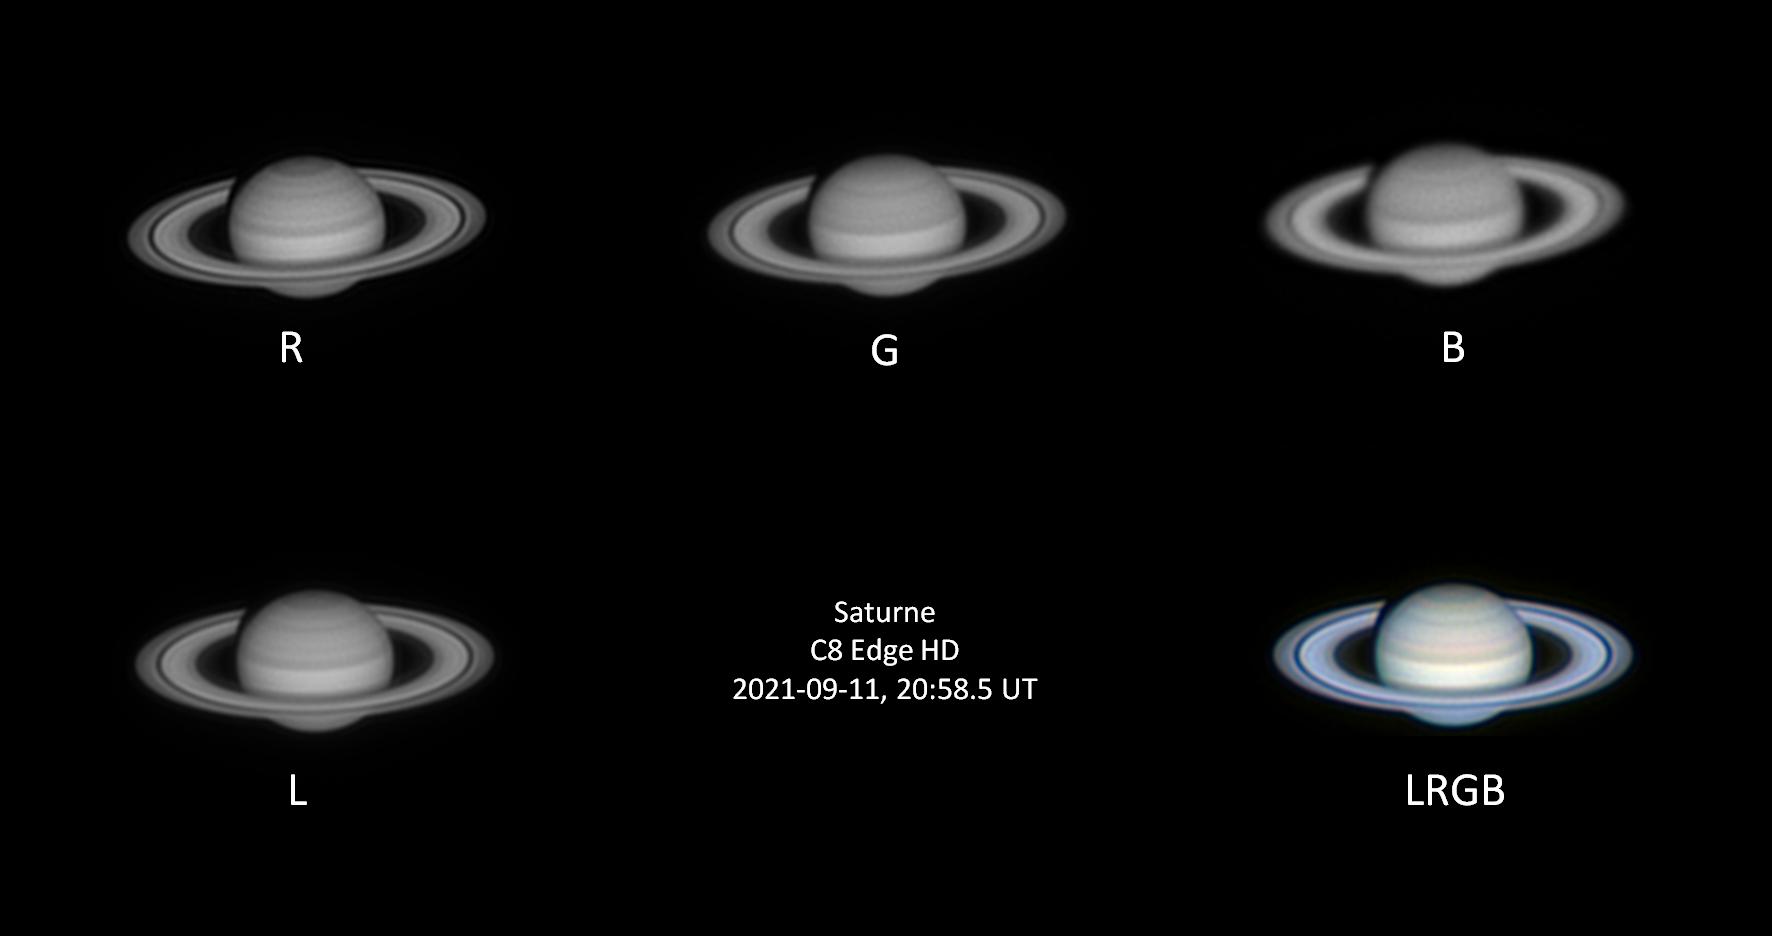 Saturne_2021-09-11-2058_5.png.6aefc2b7e790110e27065fbbd0d96524.png